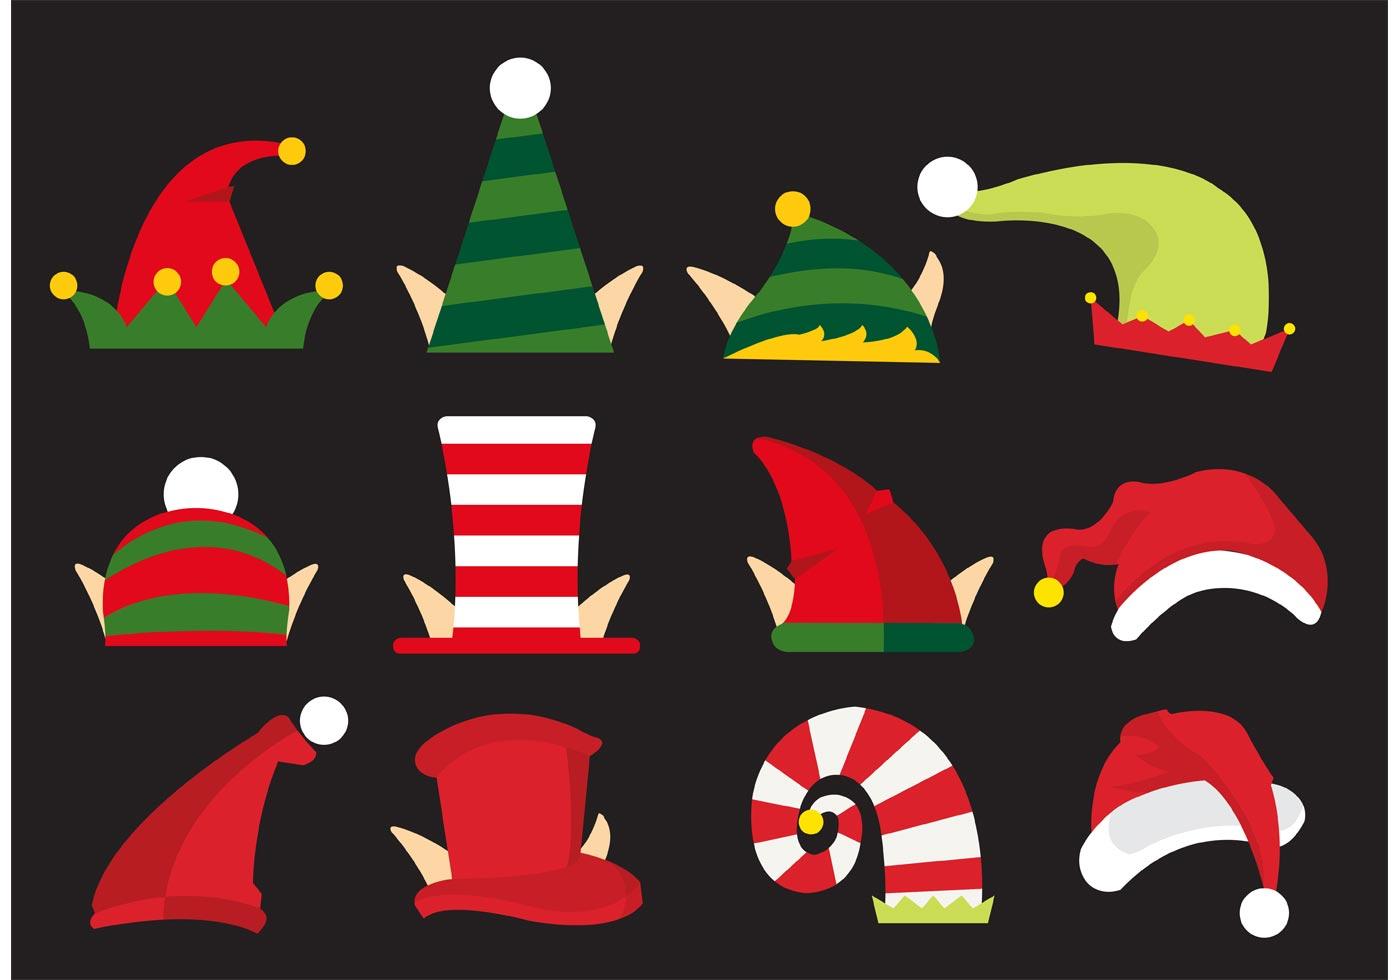 elves hat vectors download free vector art stock graphics images rh vecteezy com Black and White Elf Hat christmas elf hat vector